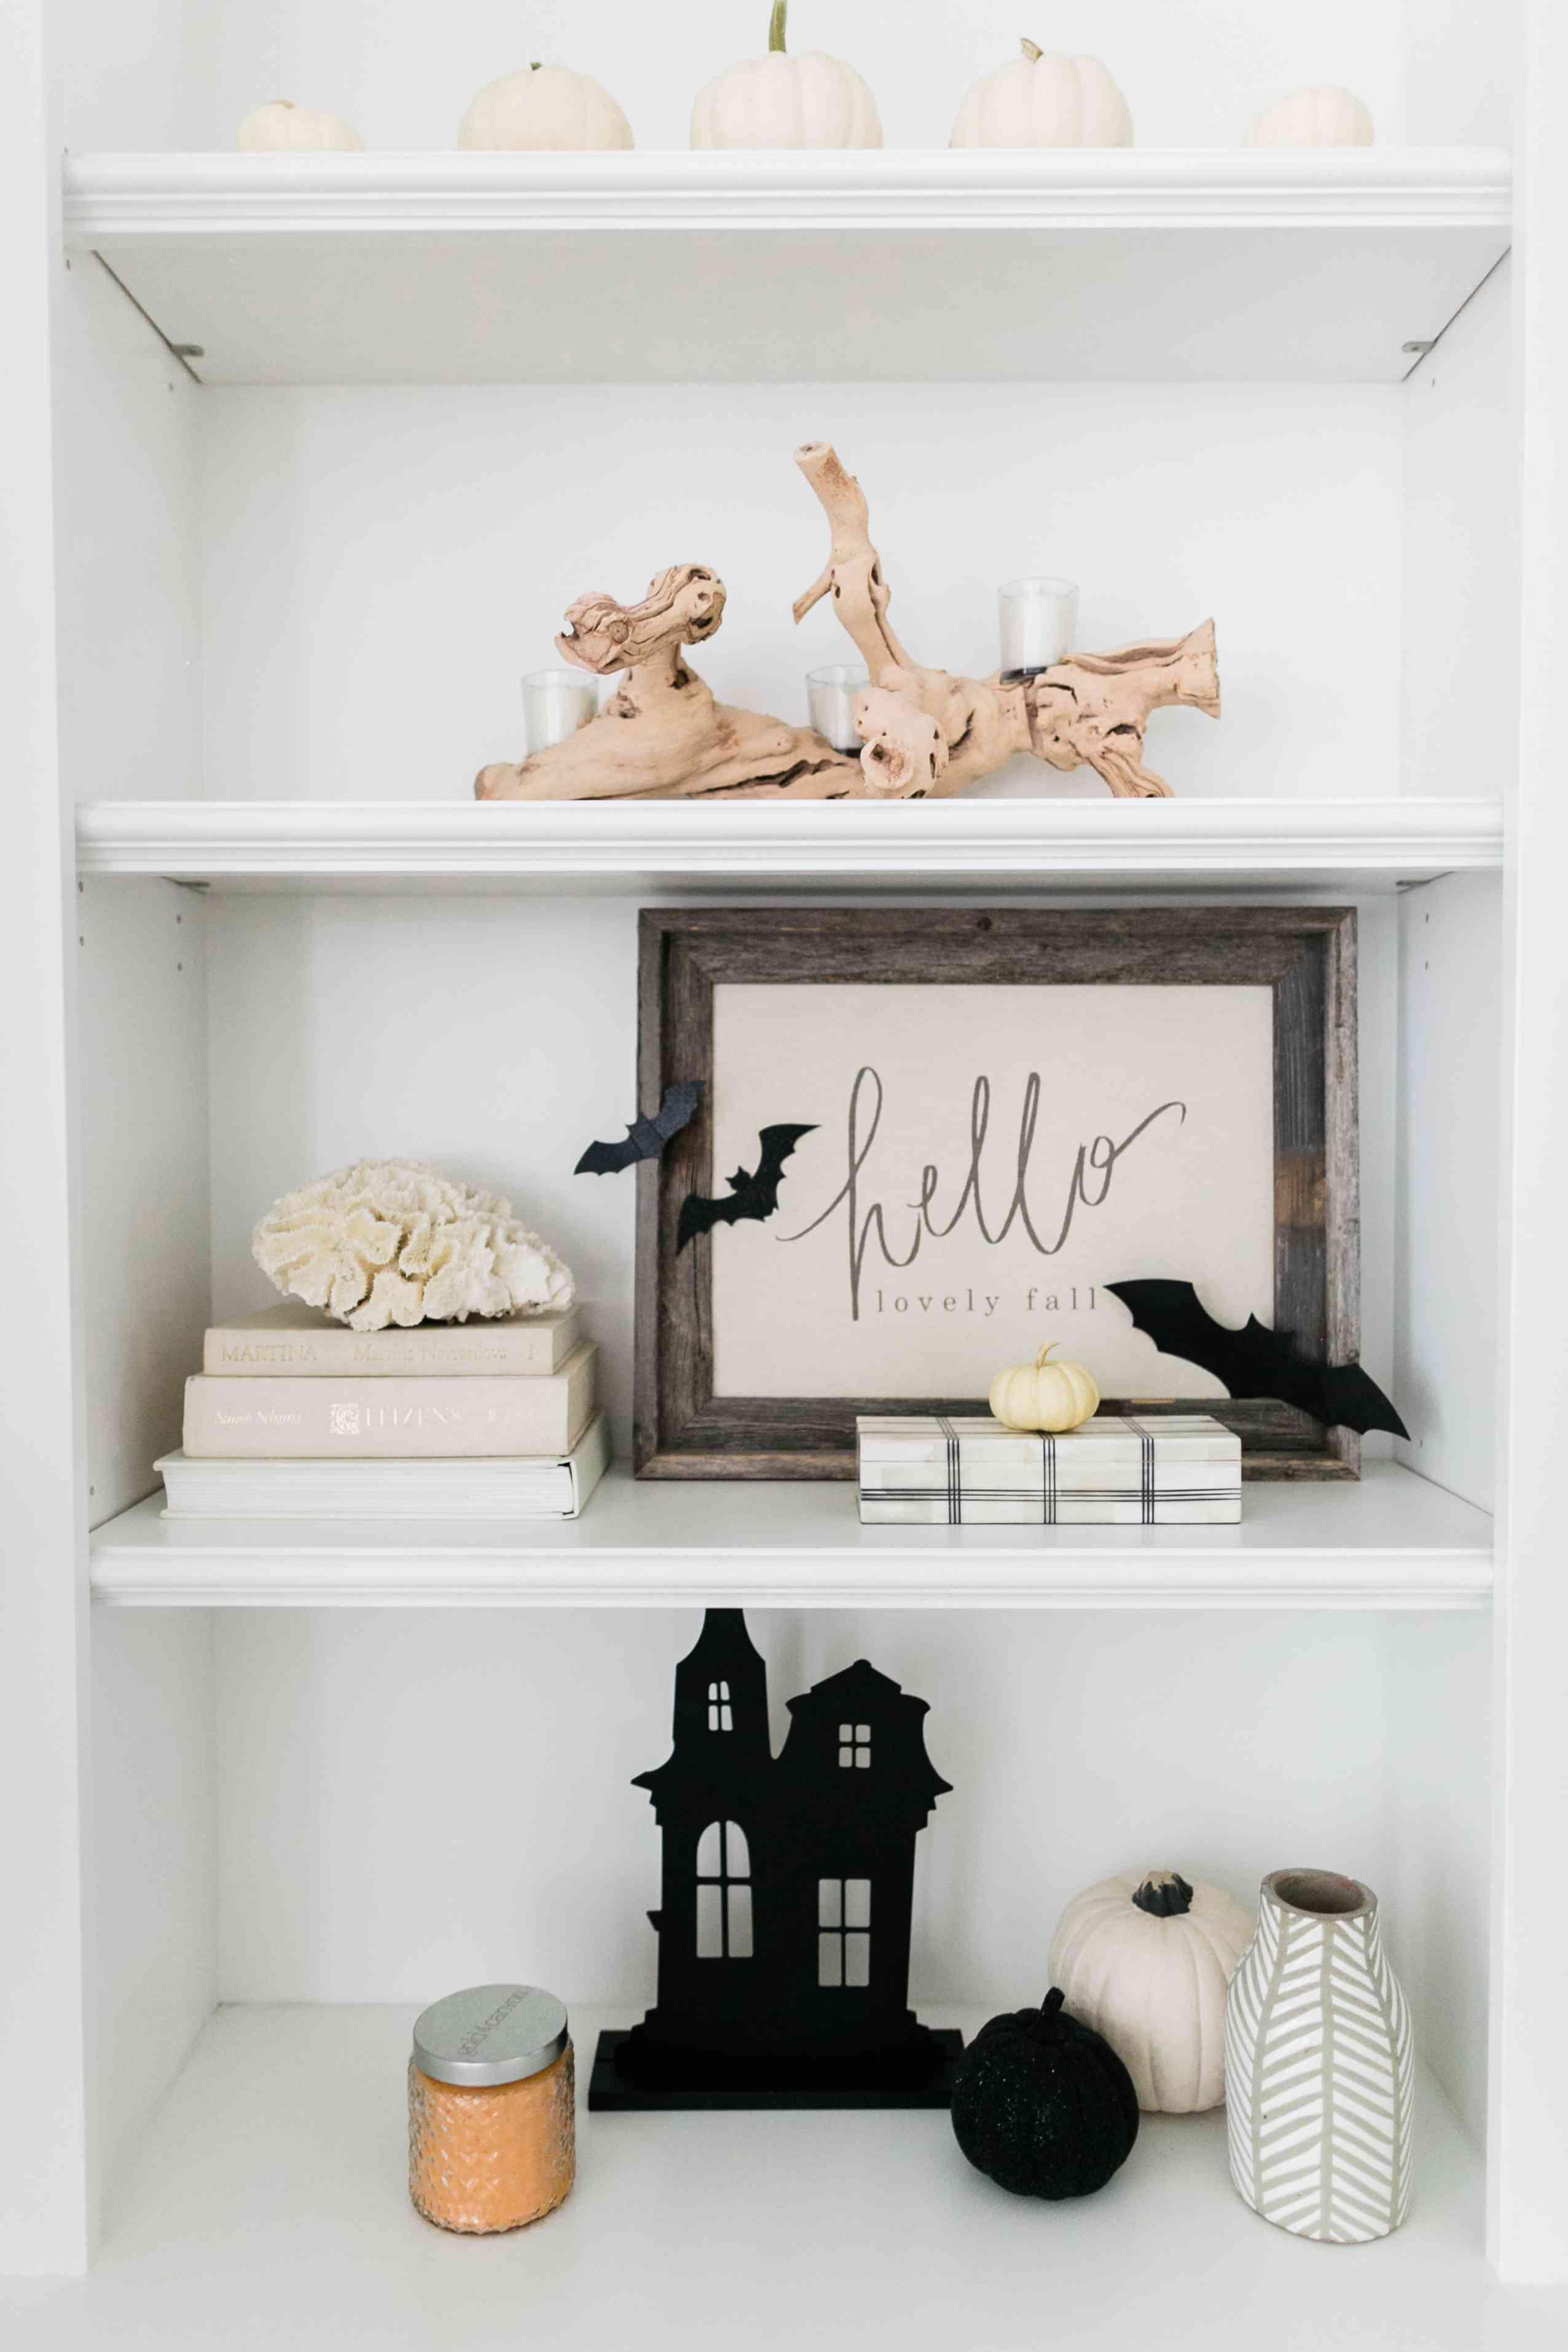 Halloween decor on bookshelf